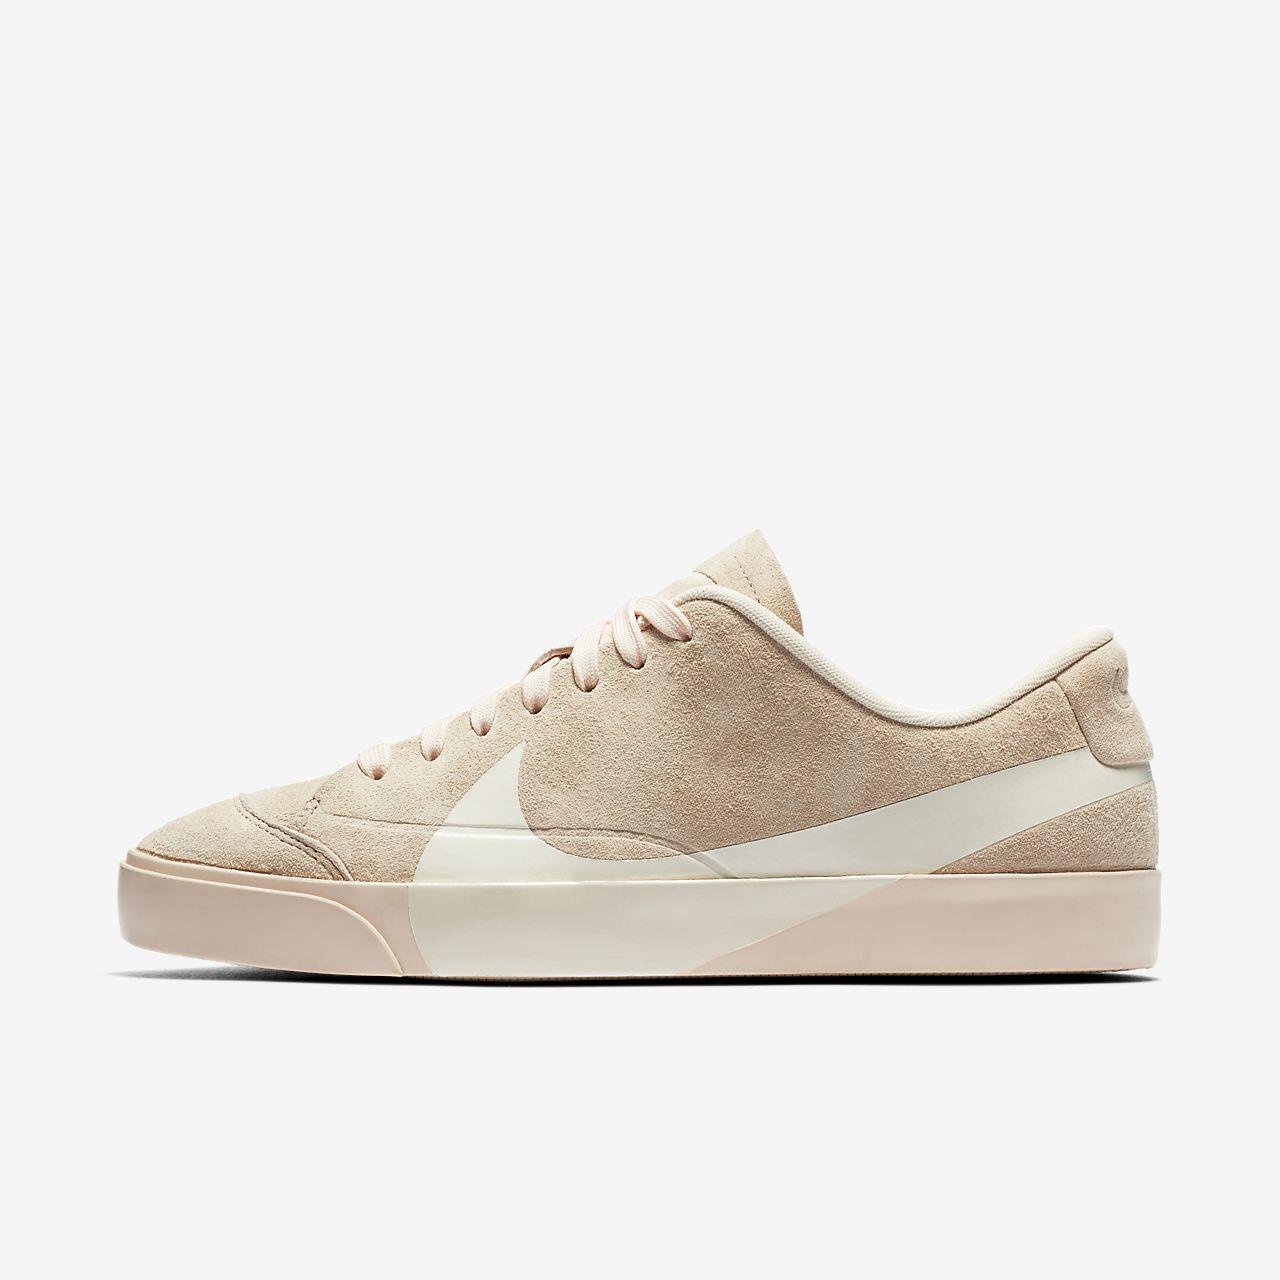 half off e6827 cf49b ... Nike Blazer City Low LX-sko til kvinder